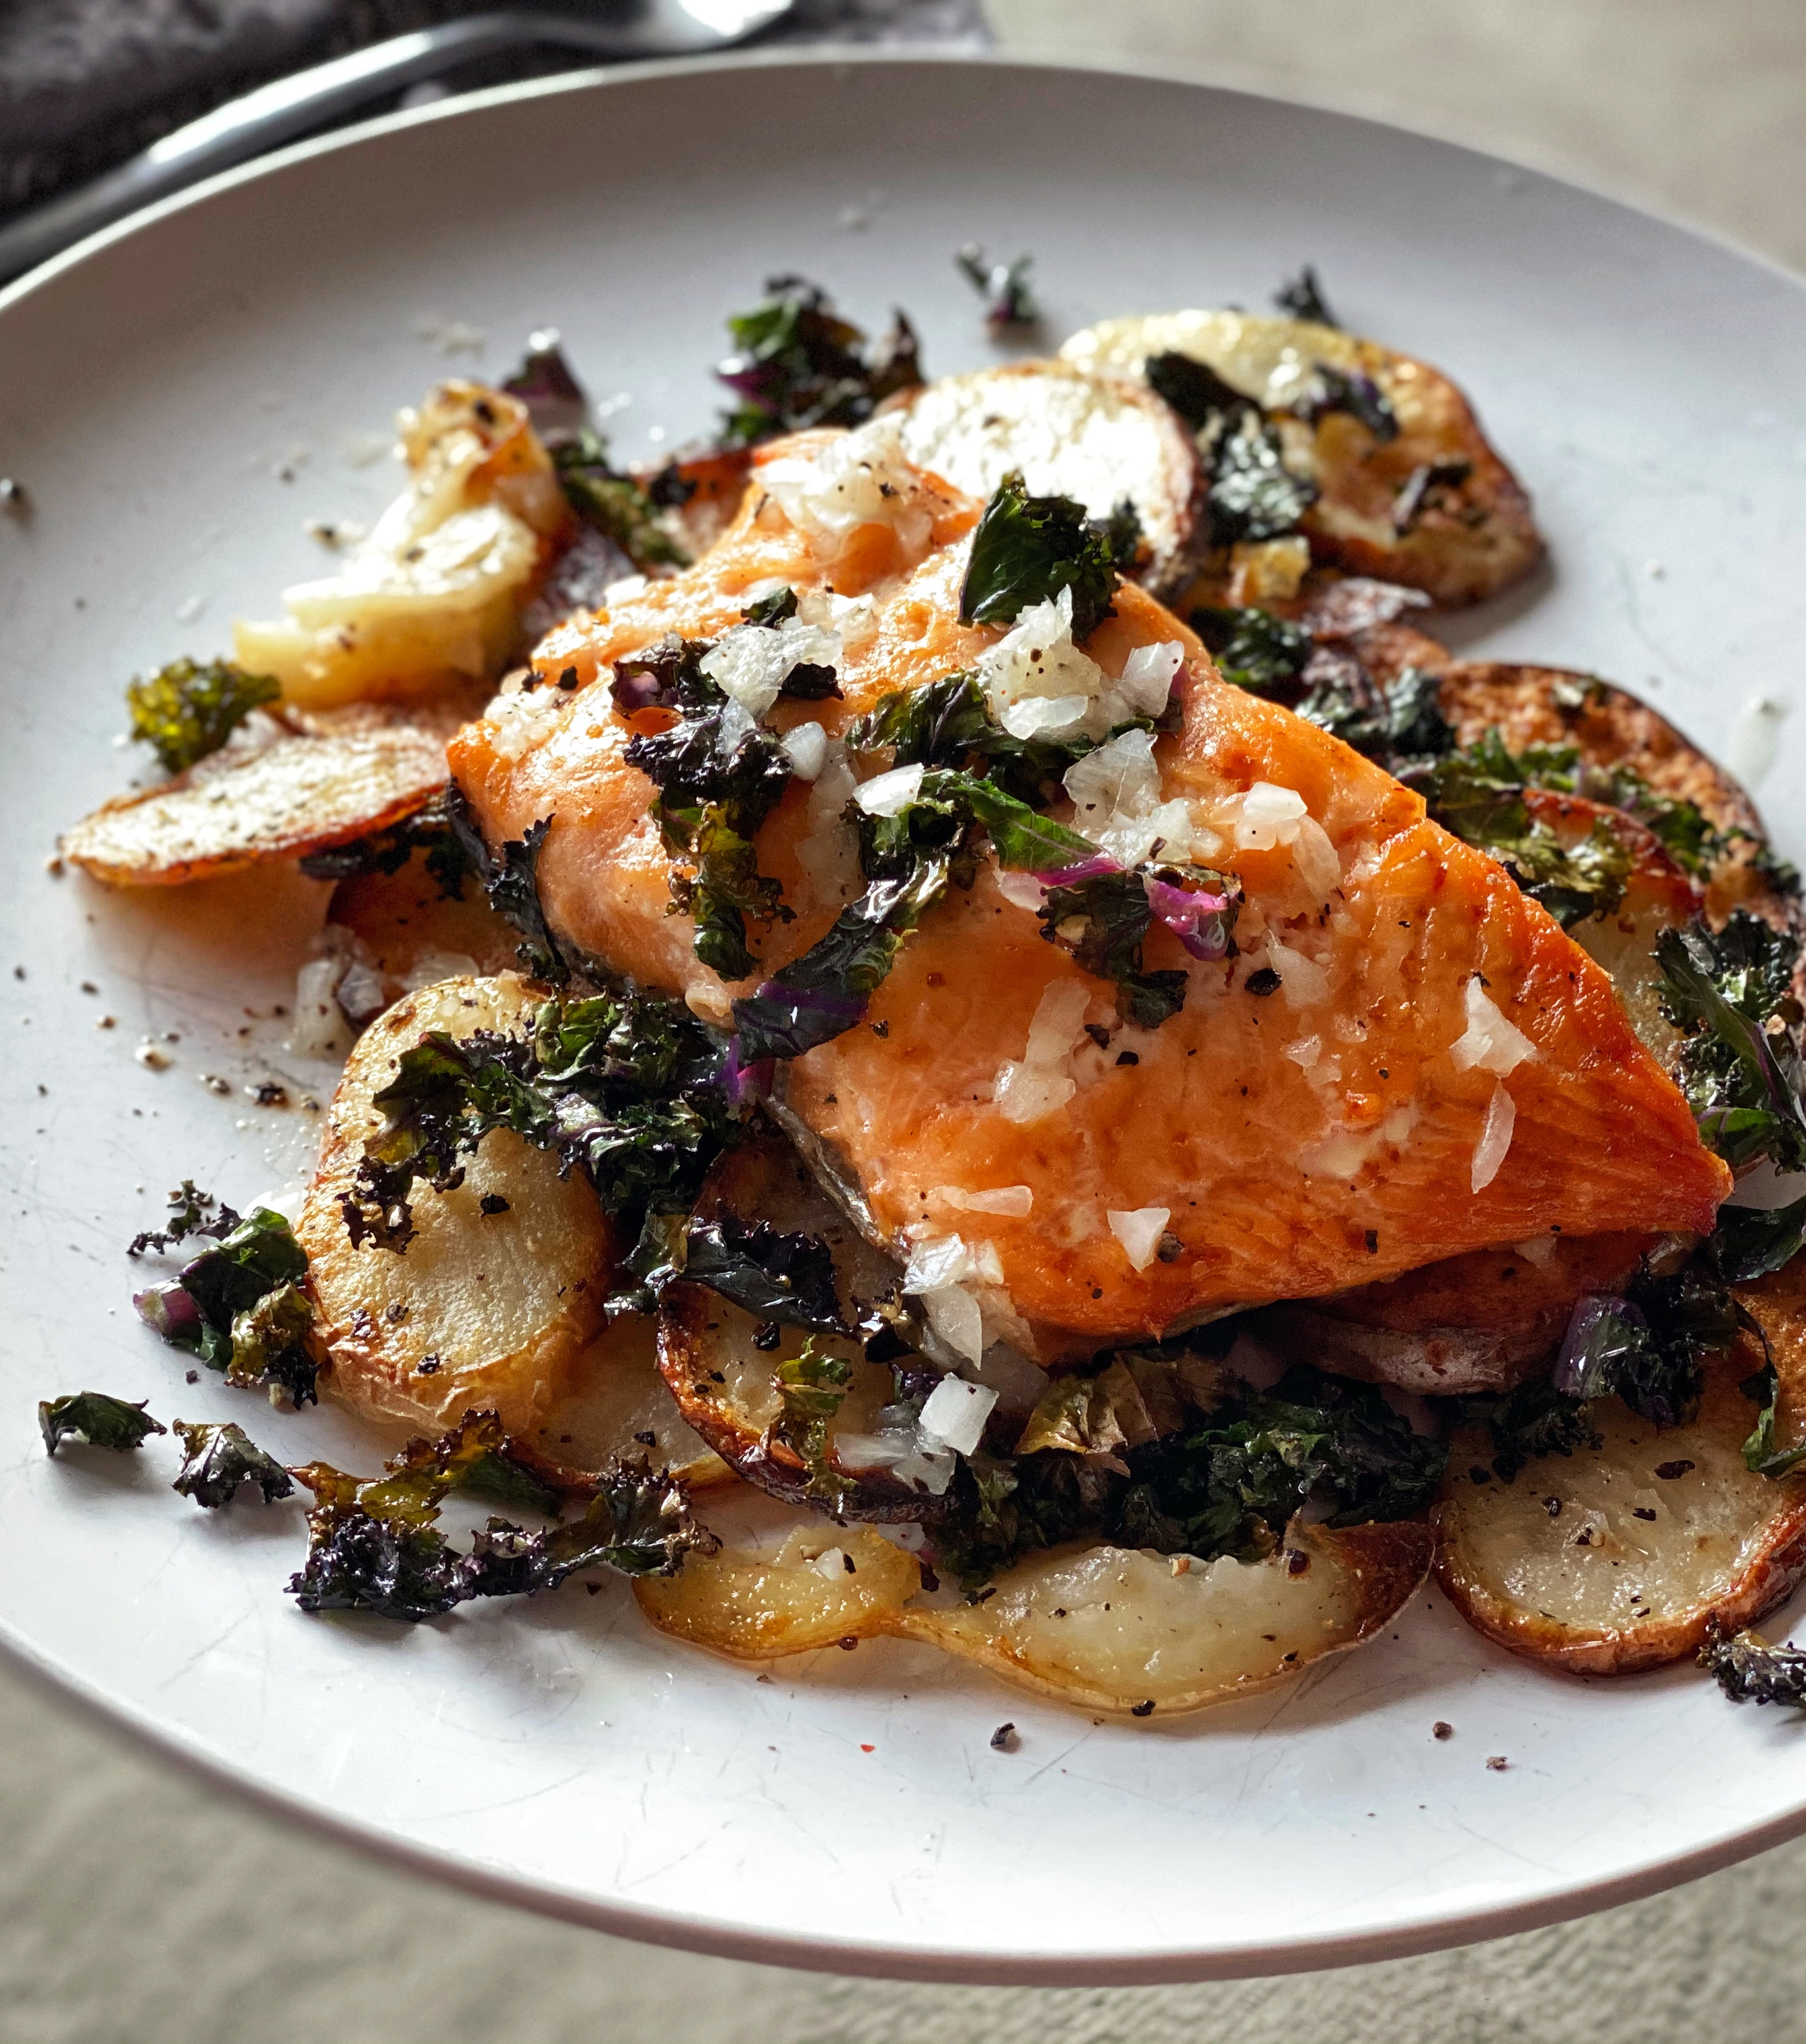 Roasted Salmon, Potatoes & Kale